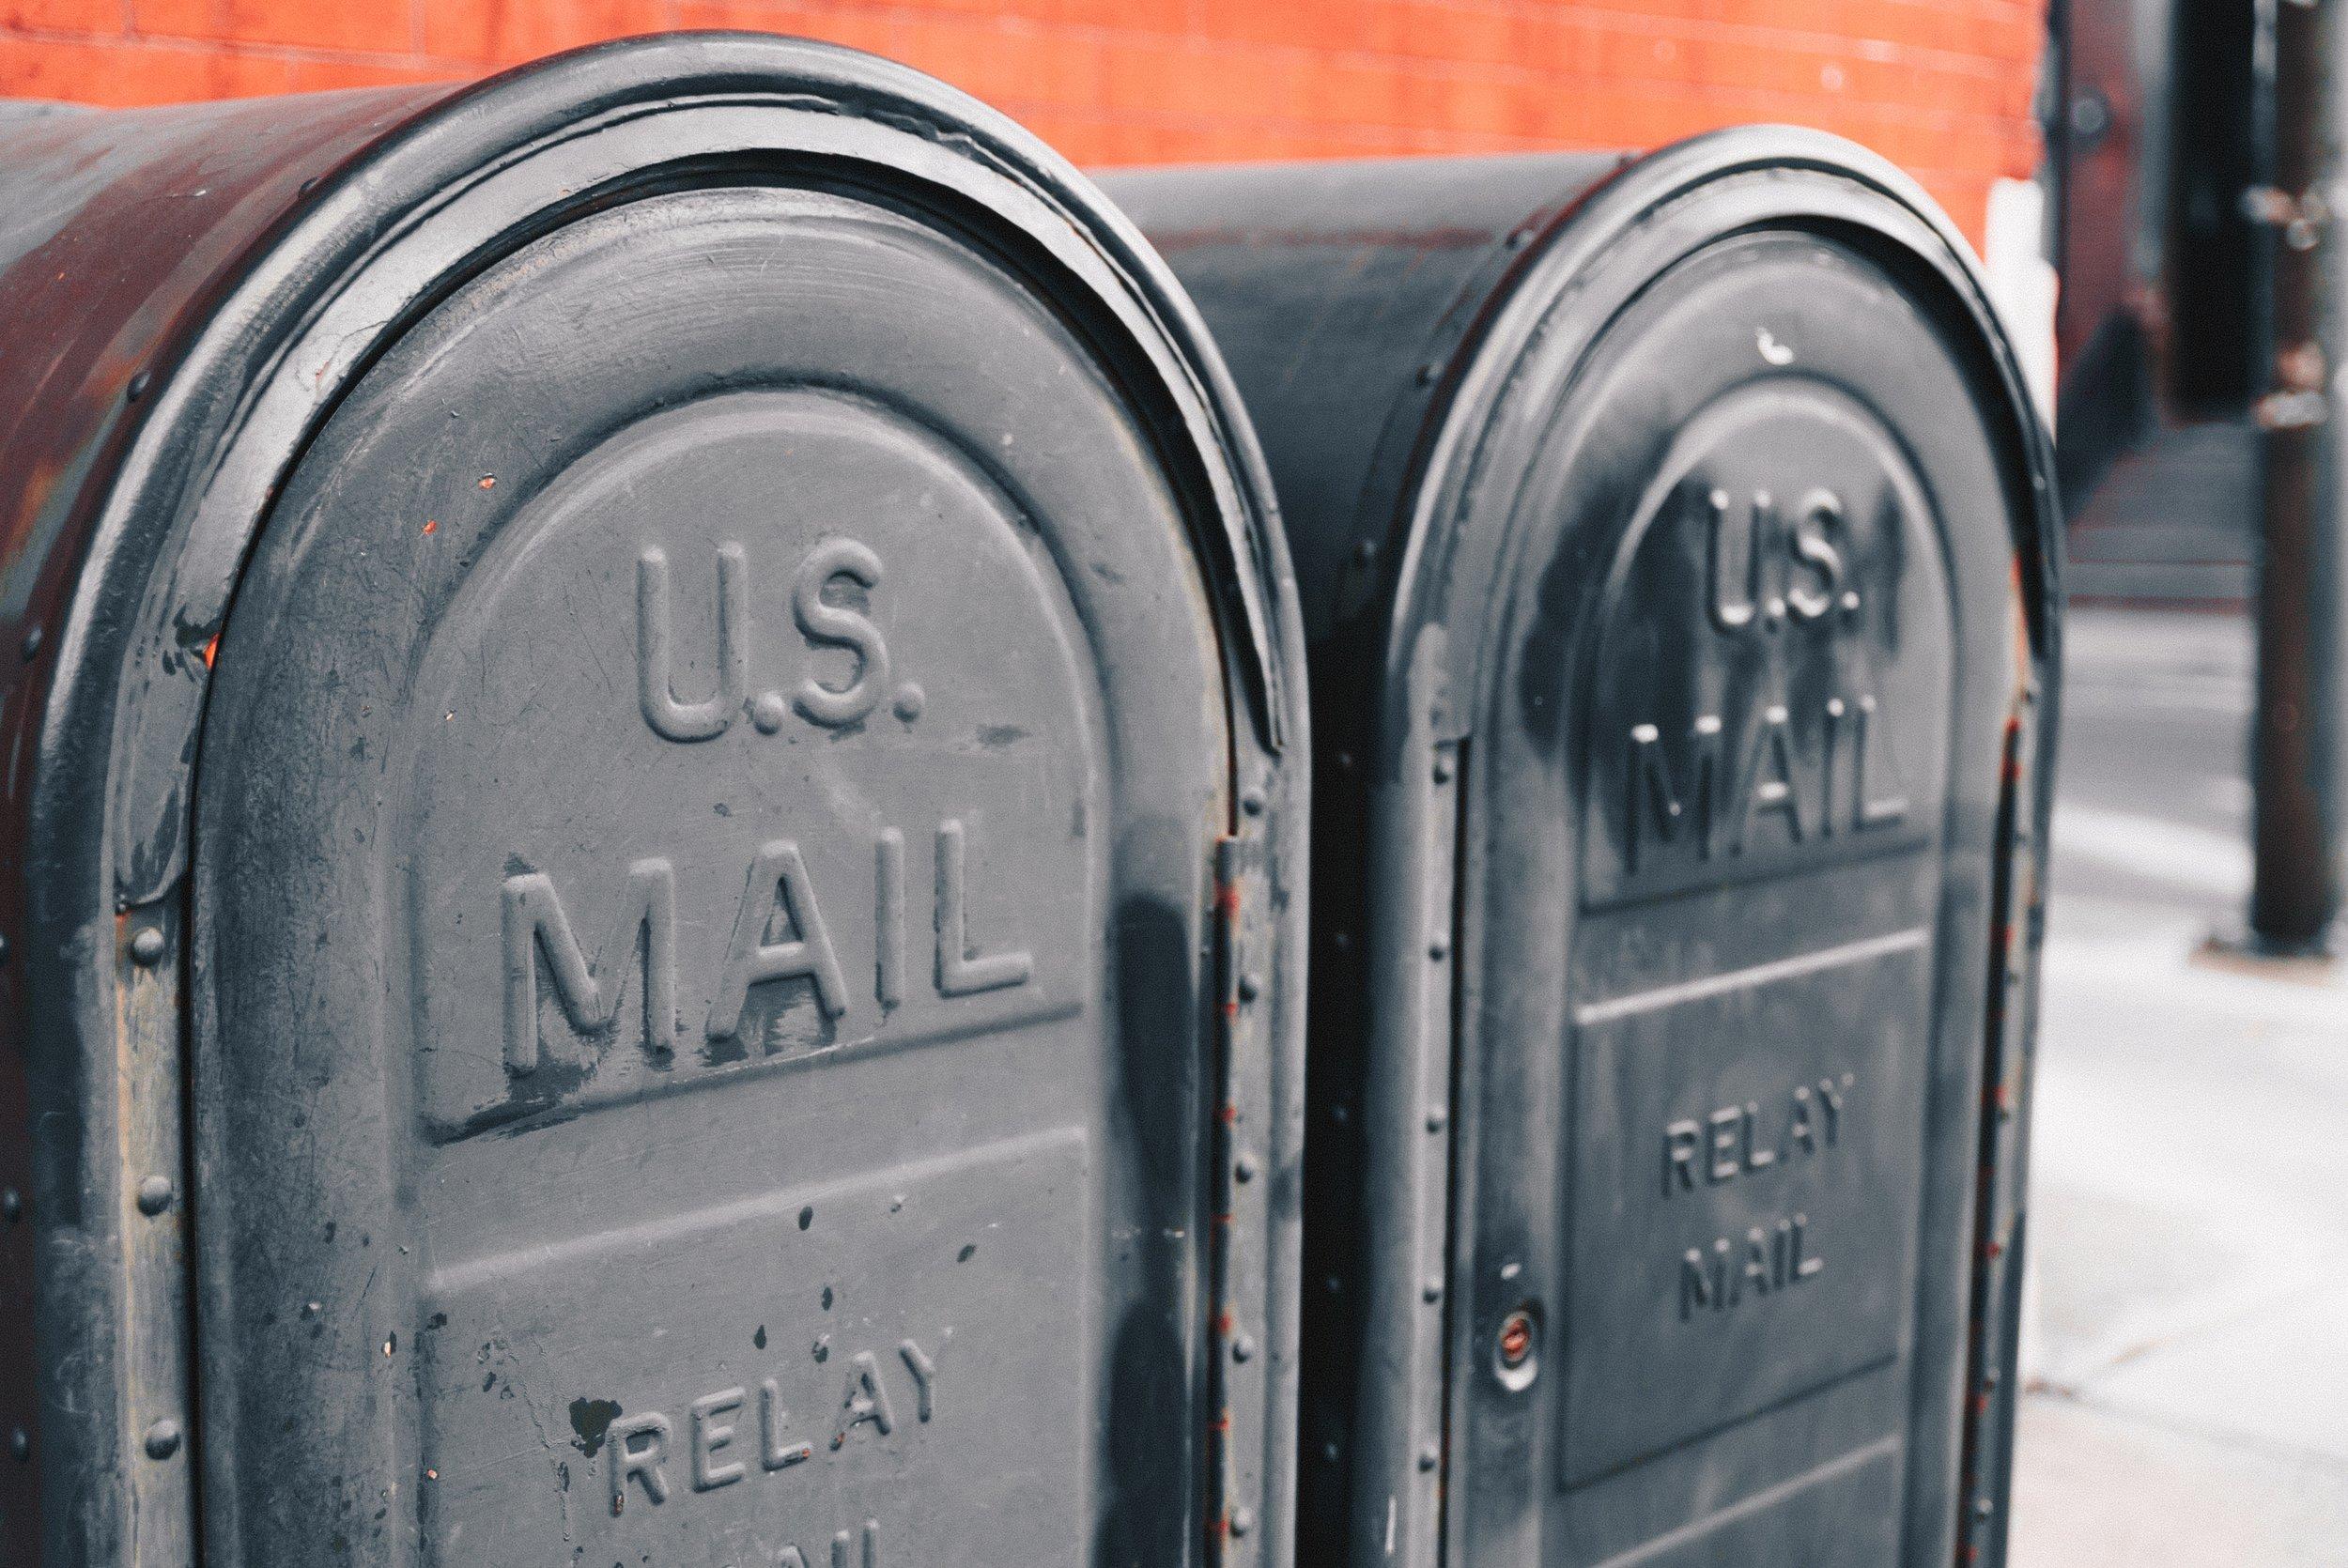 Mail Ticks